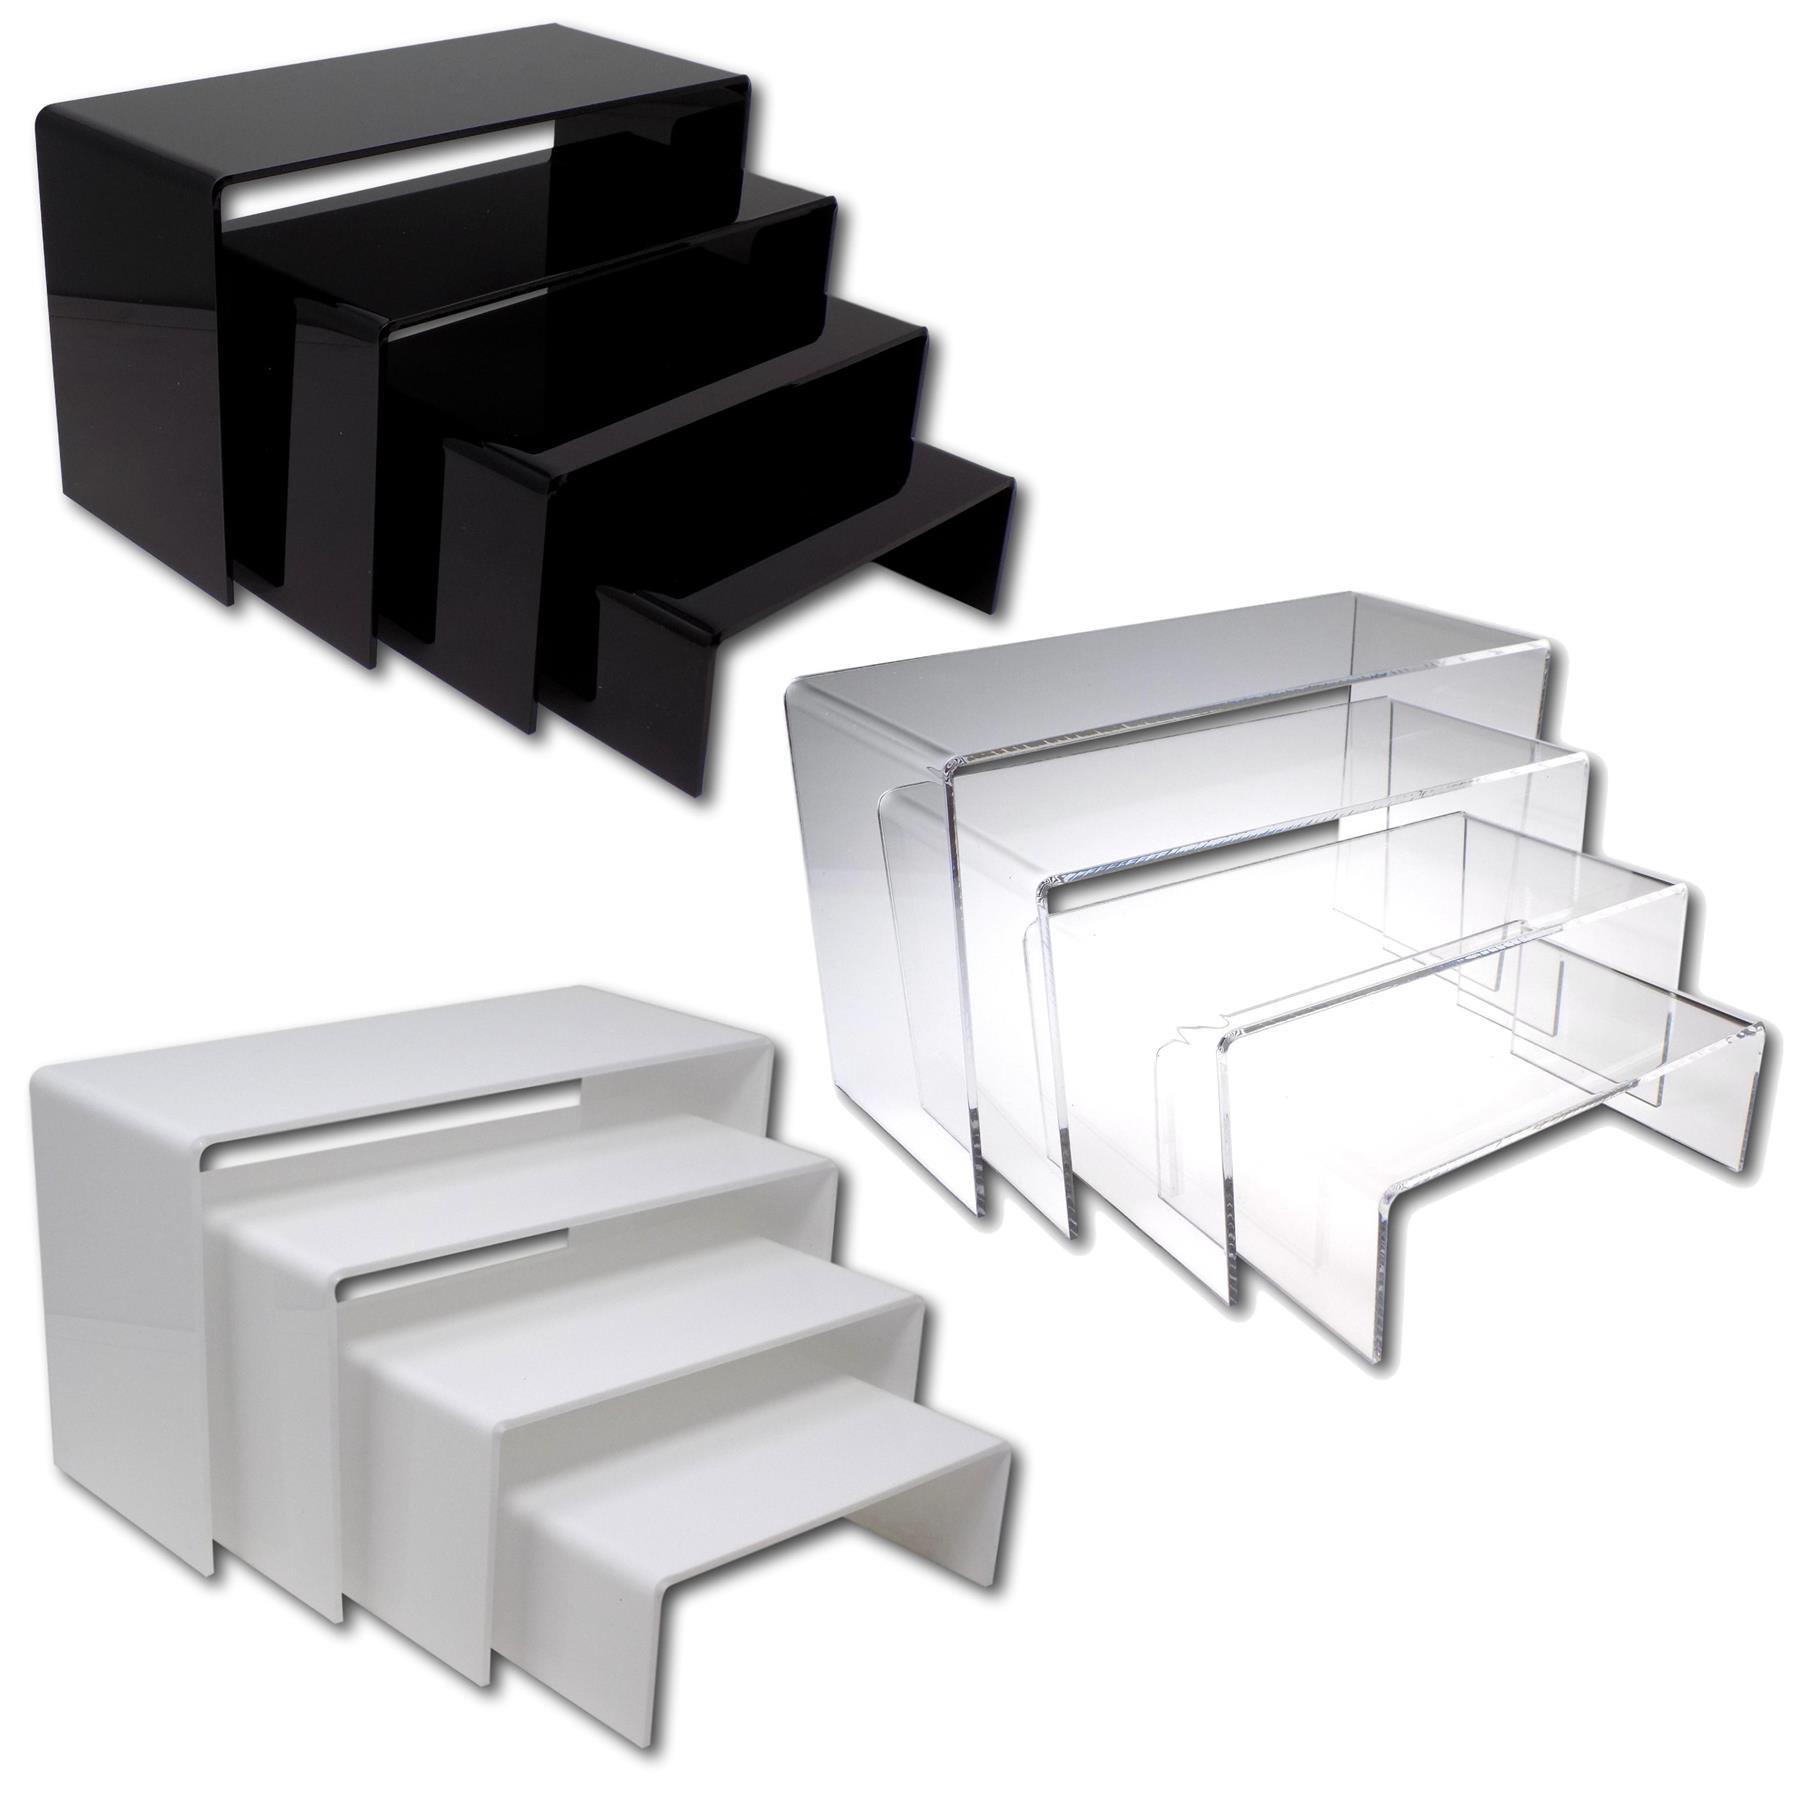 Exhibition Stand Shelves : Hole hole plate shelves high quality goods display shelf mobile